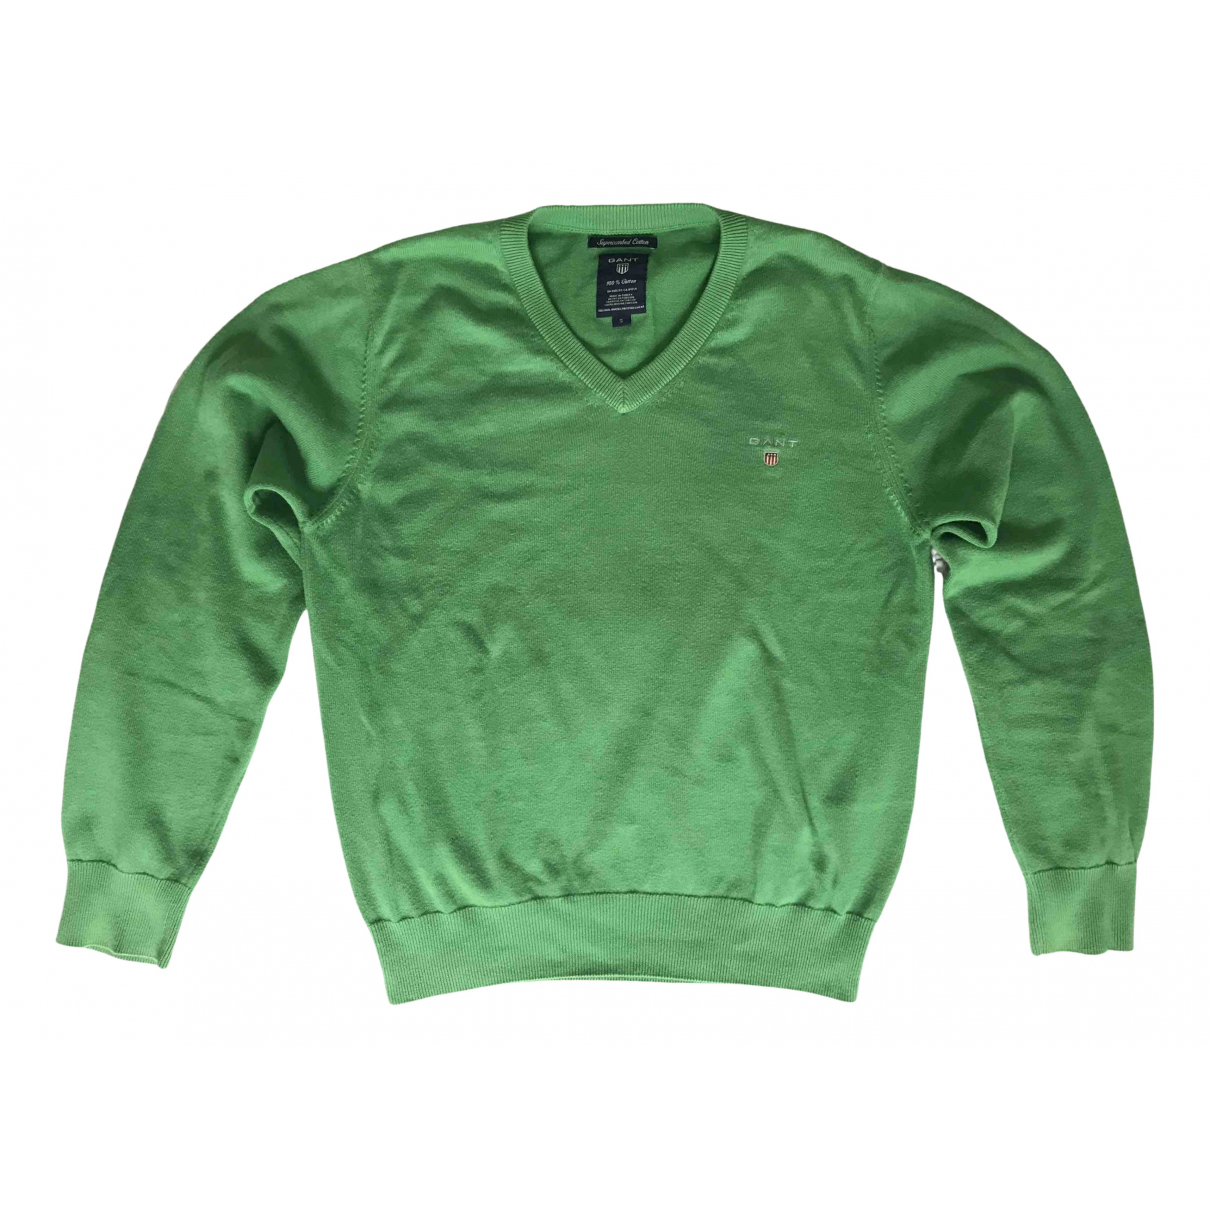 Gant \N Green Cotton Knitwear & Sweatshirts for Men S International